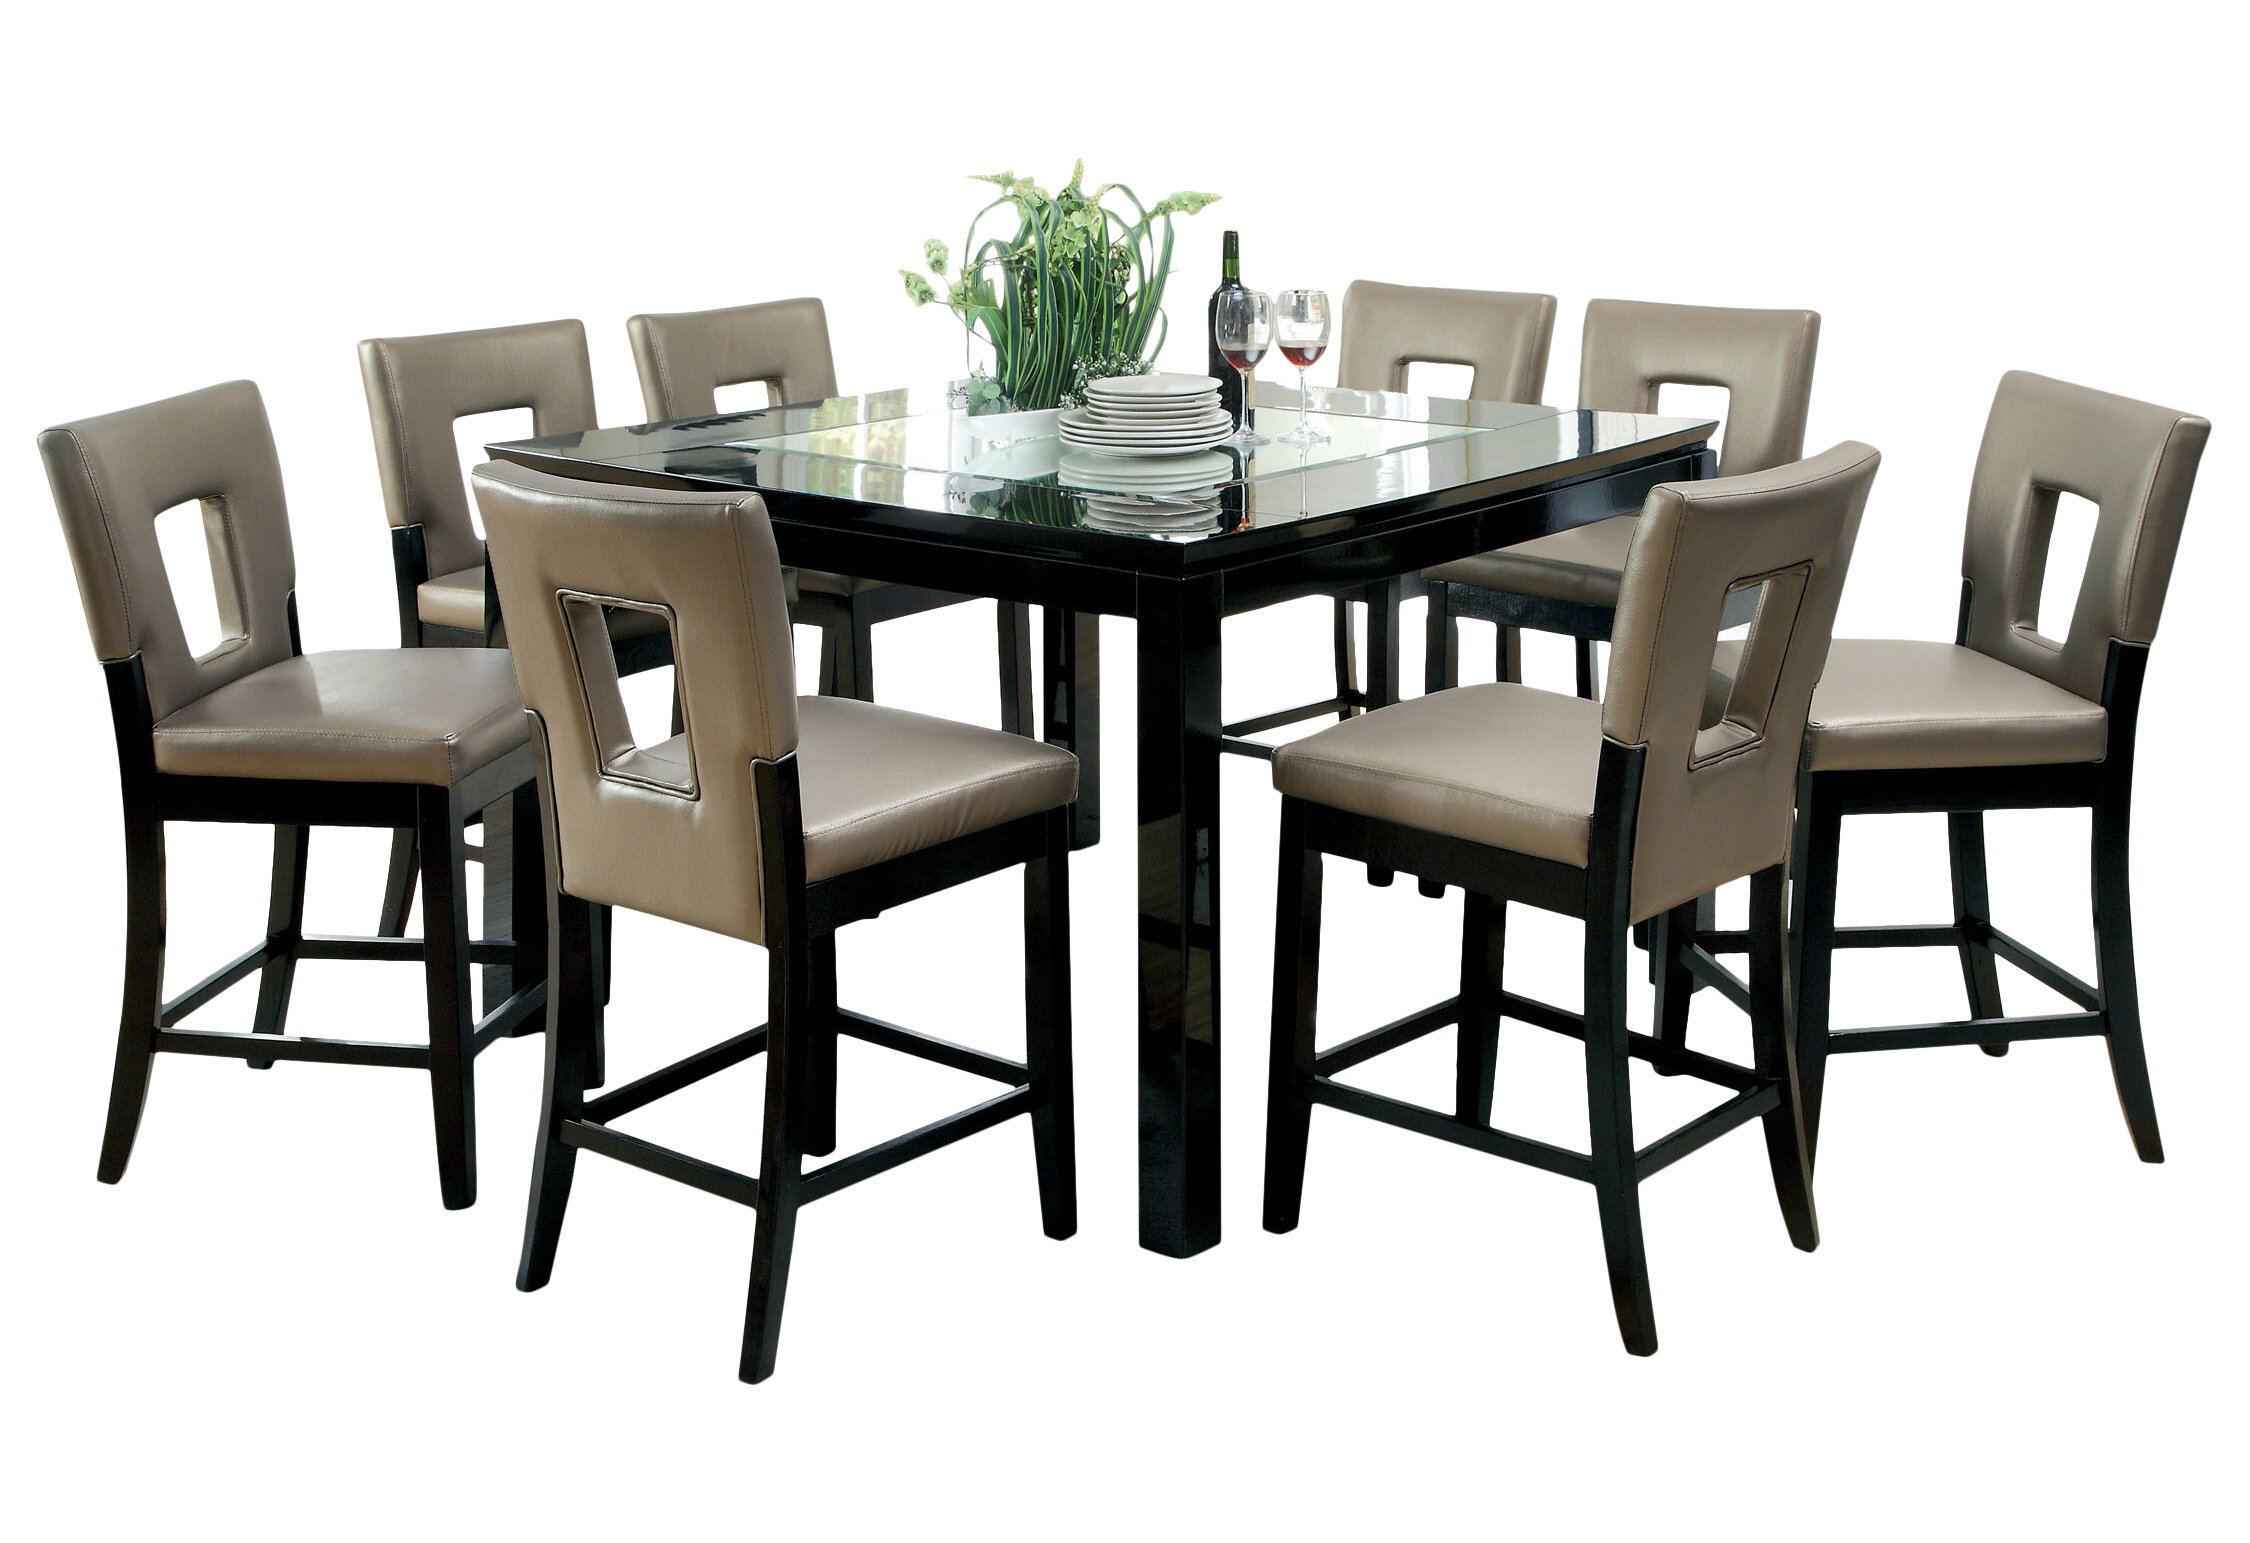 Hokku Designs Vanderbilte 9 Piece Counter Height Dining Set | Wayfair